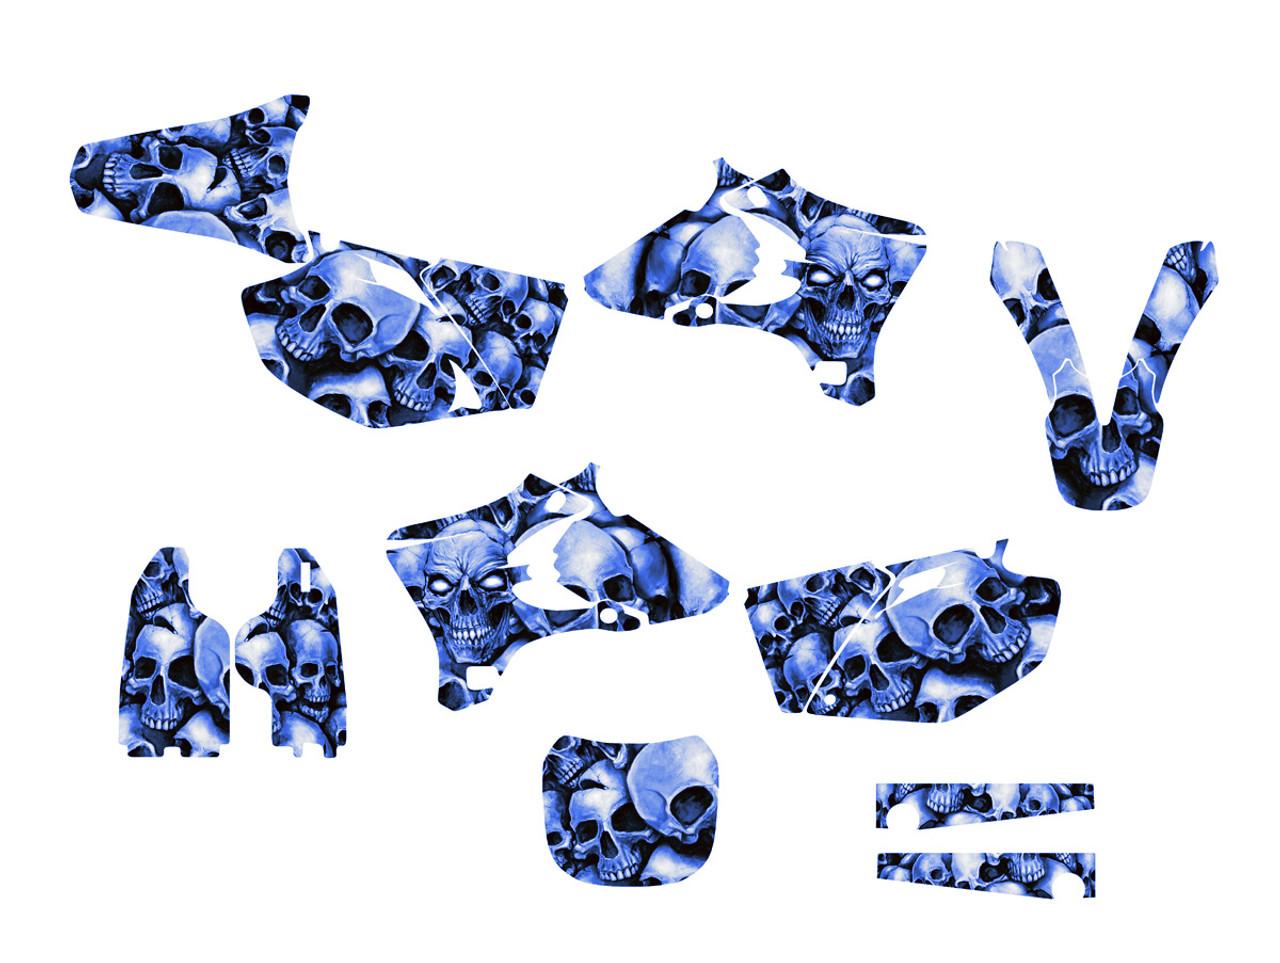 Yamaha YZ250F and YZ450F graphics sticker kit with blue boneyard